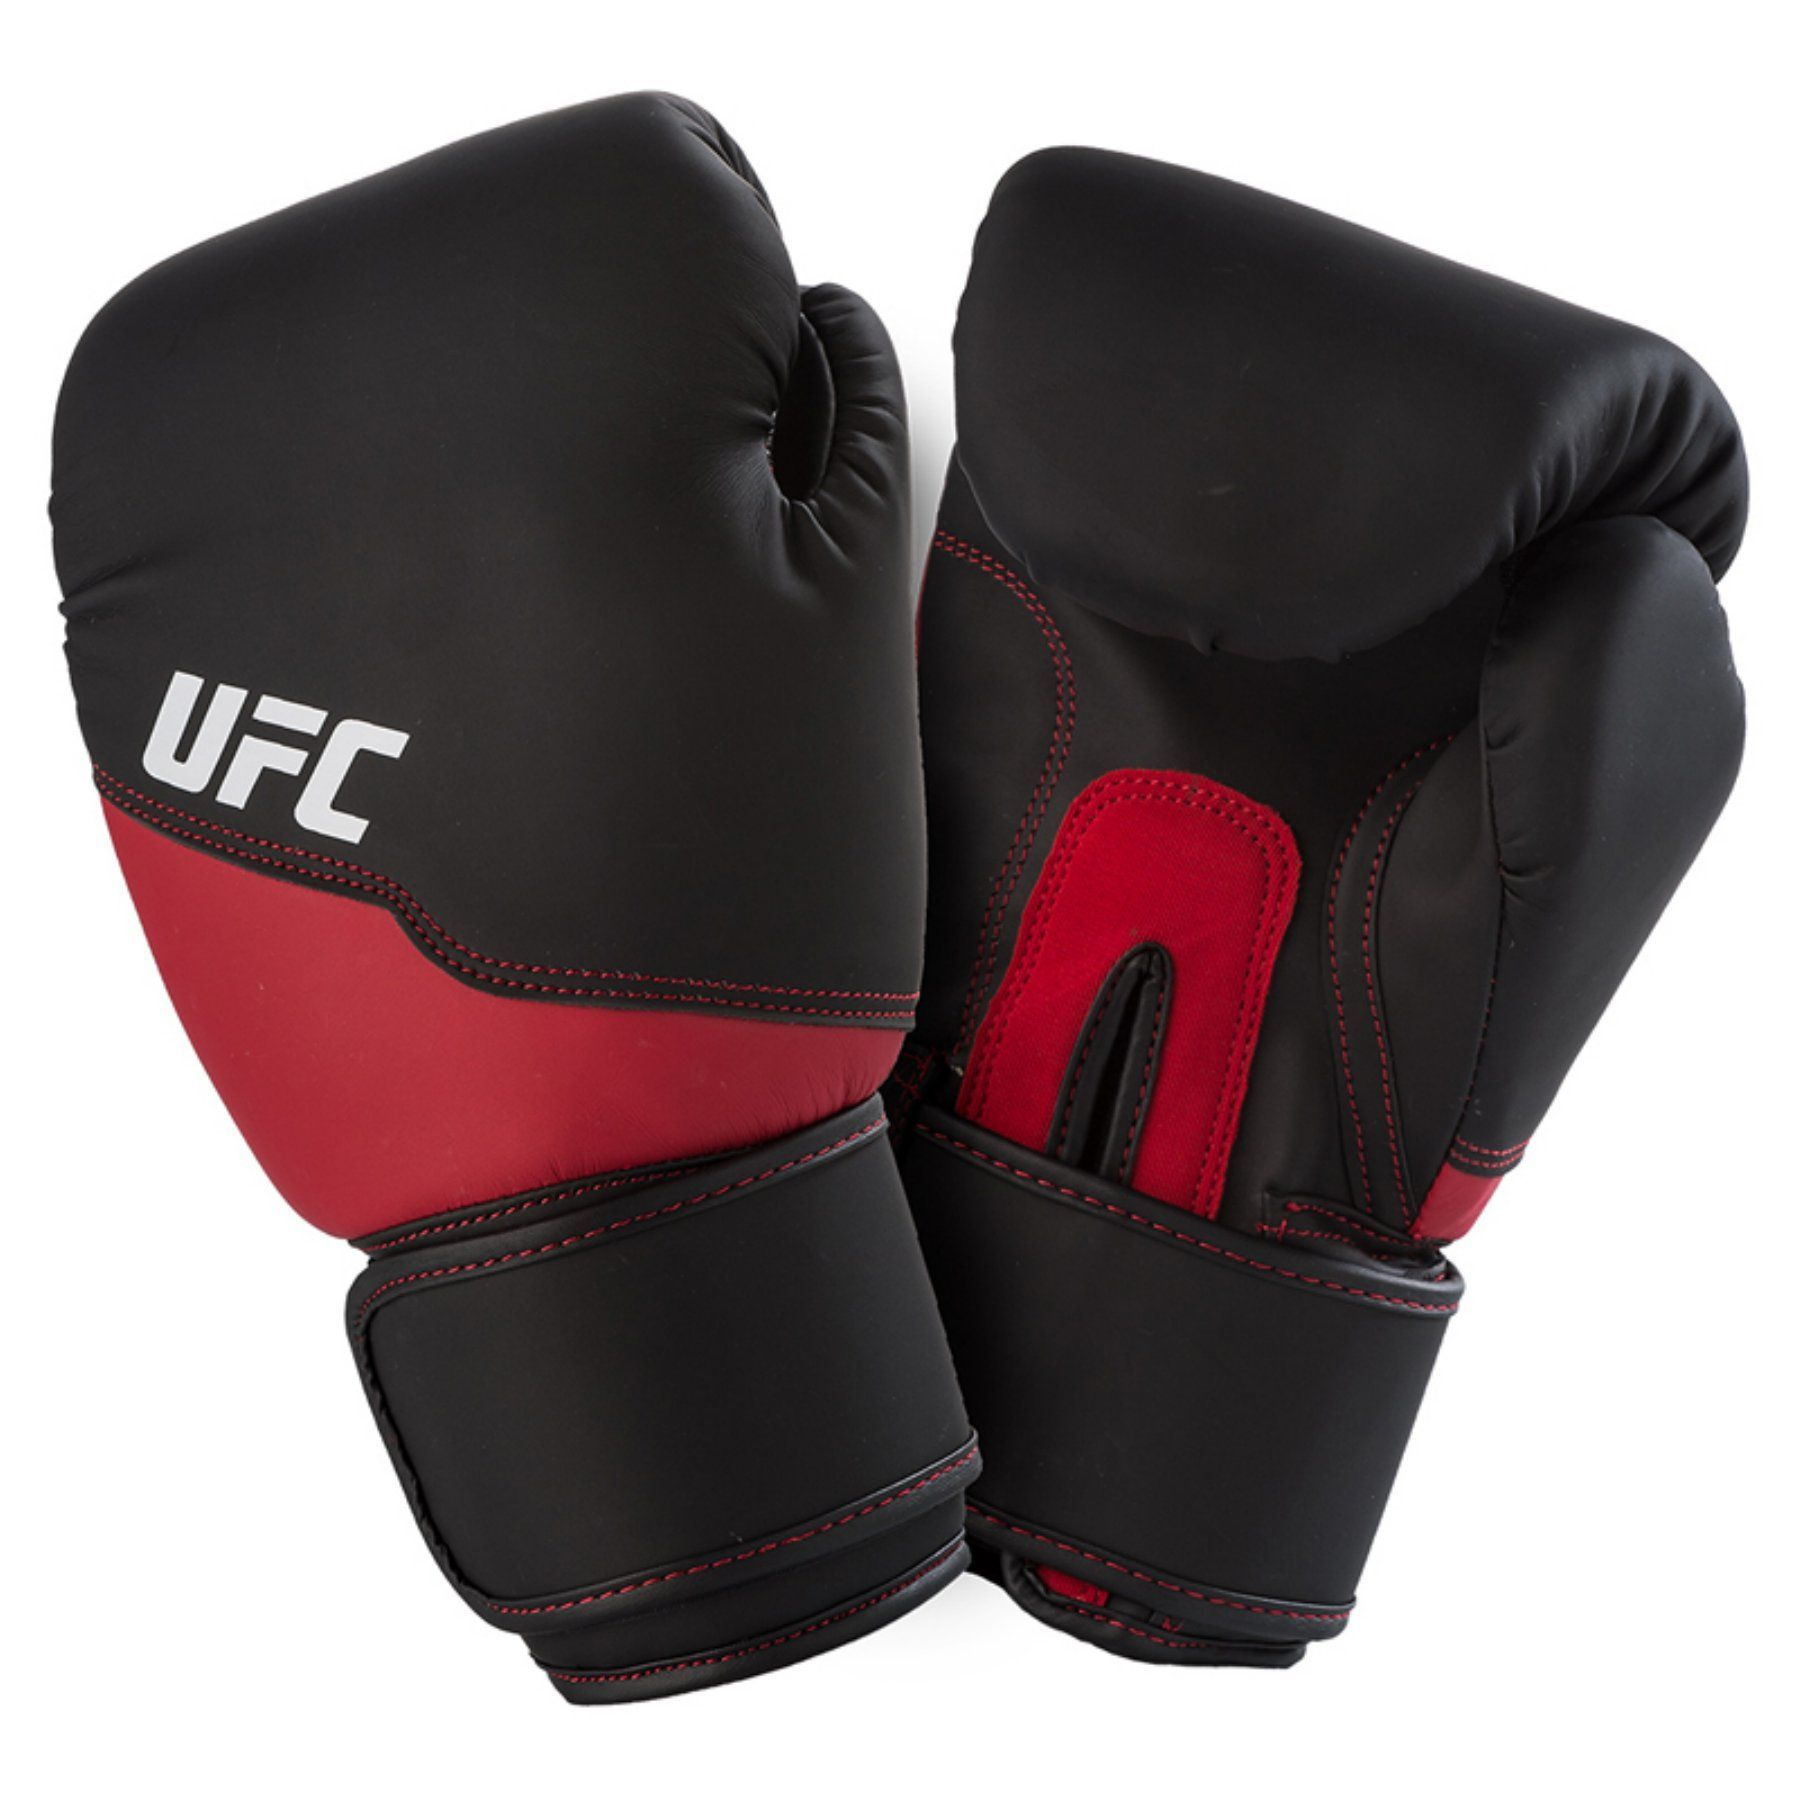 UFC Competition Grade Muay Thai Gloves 148703P019712